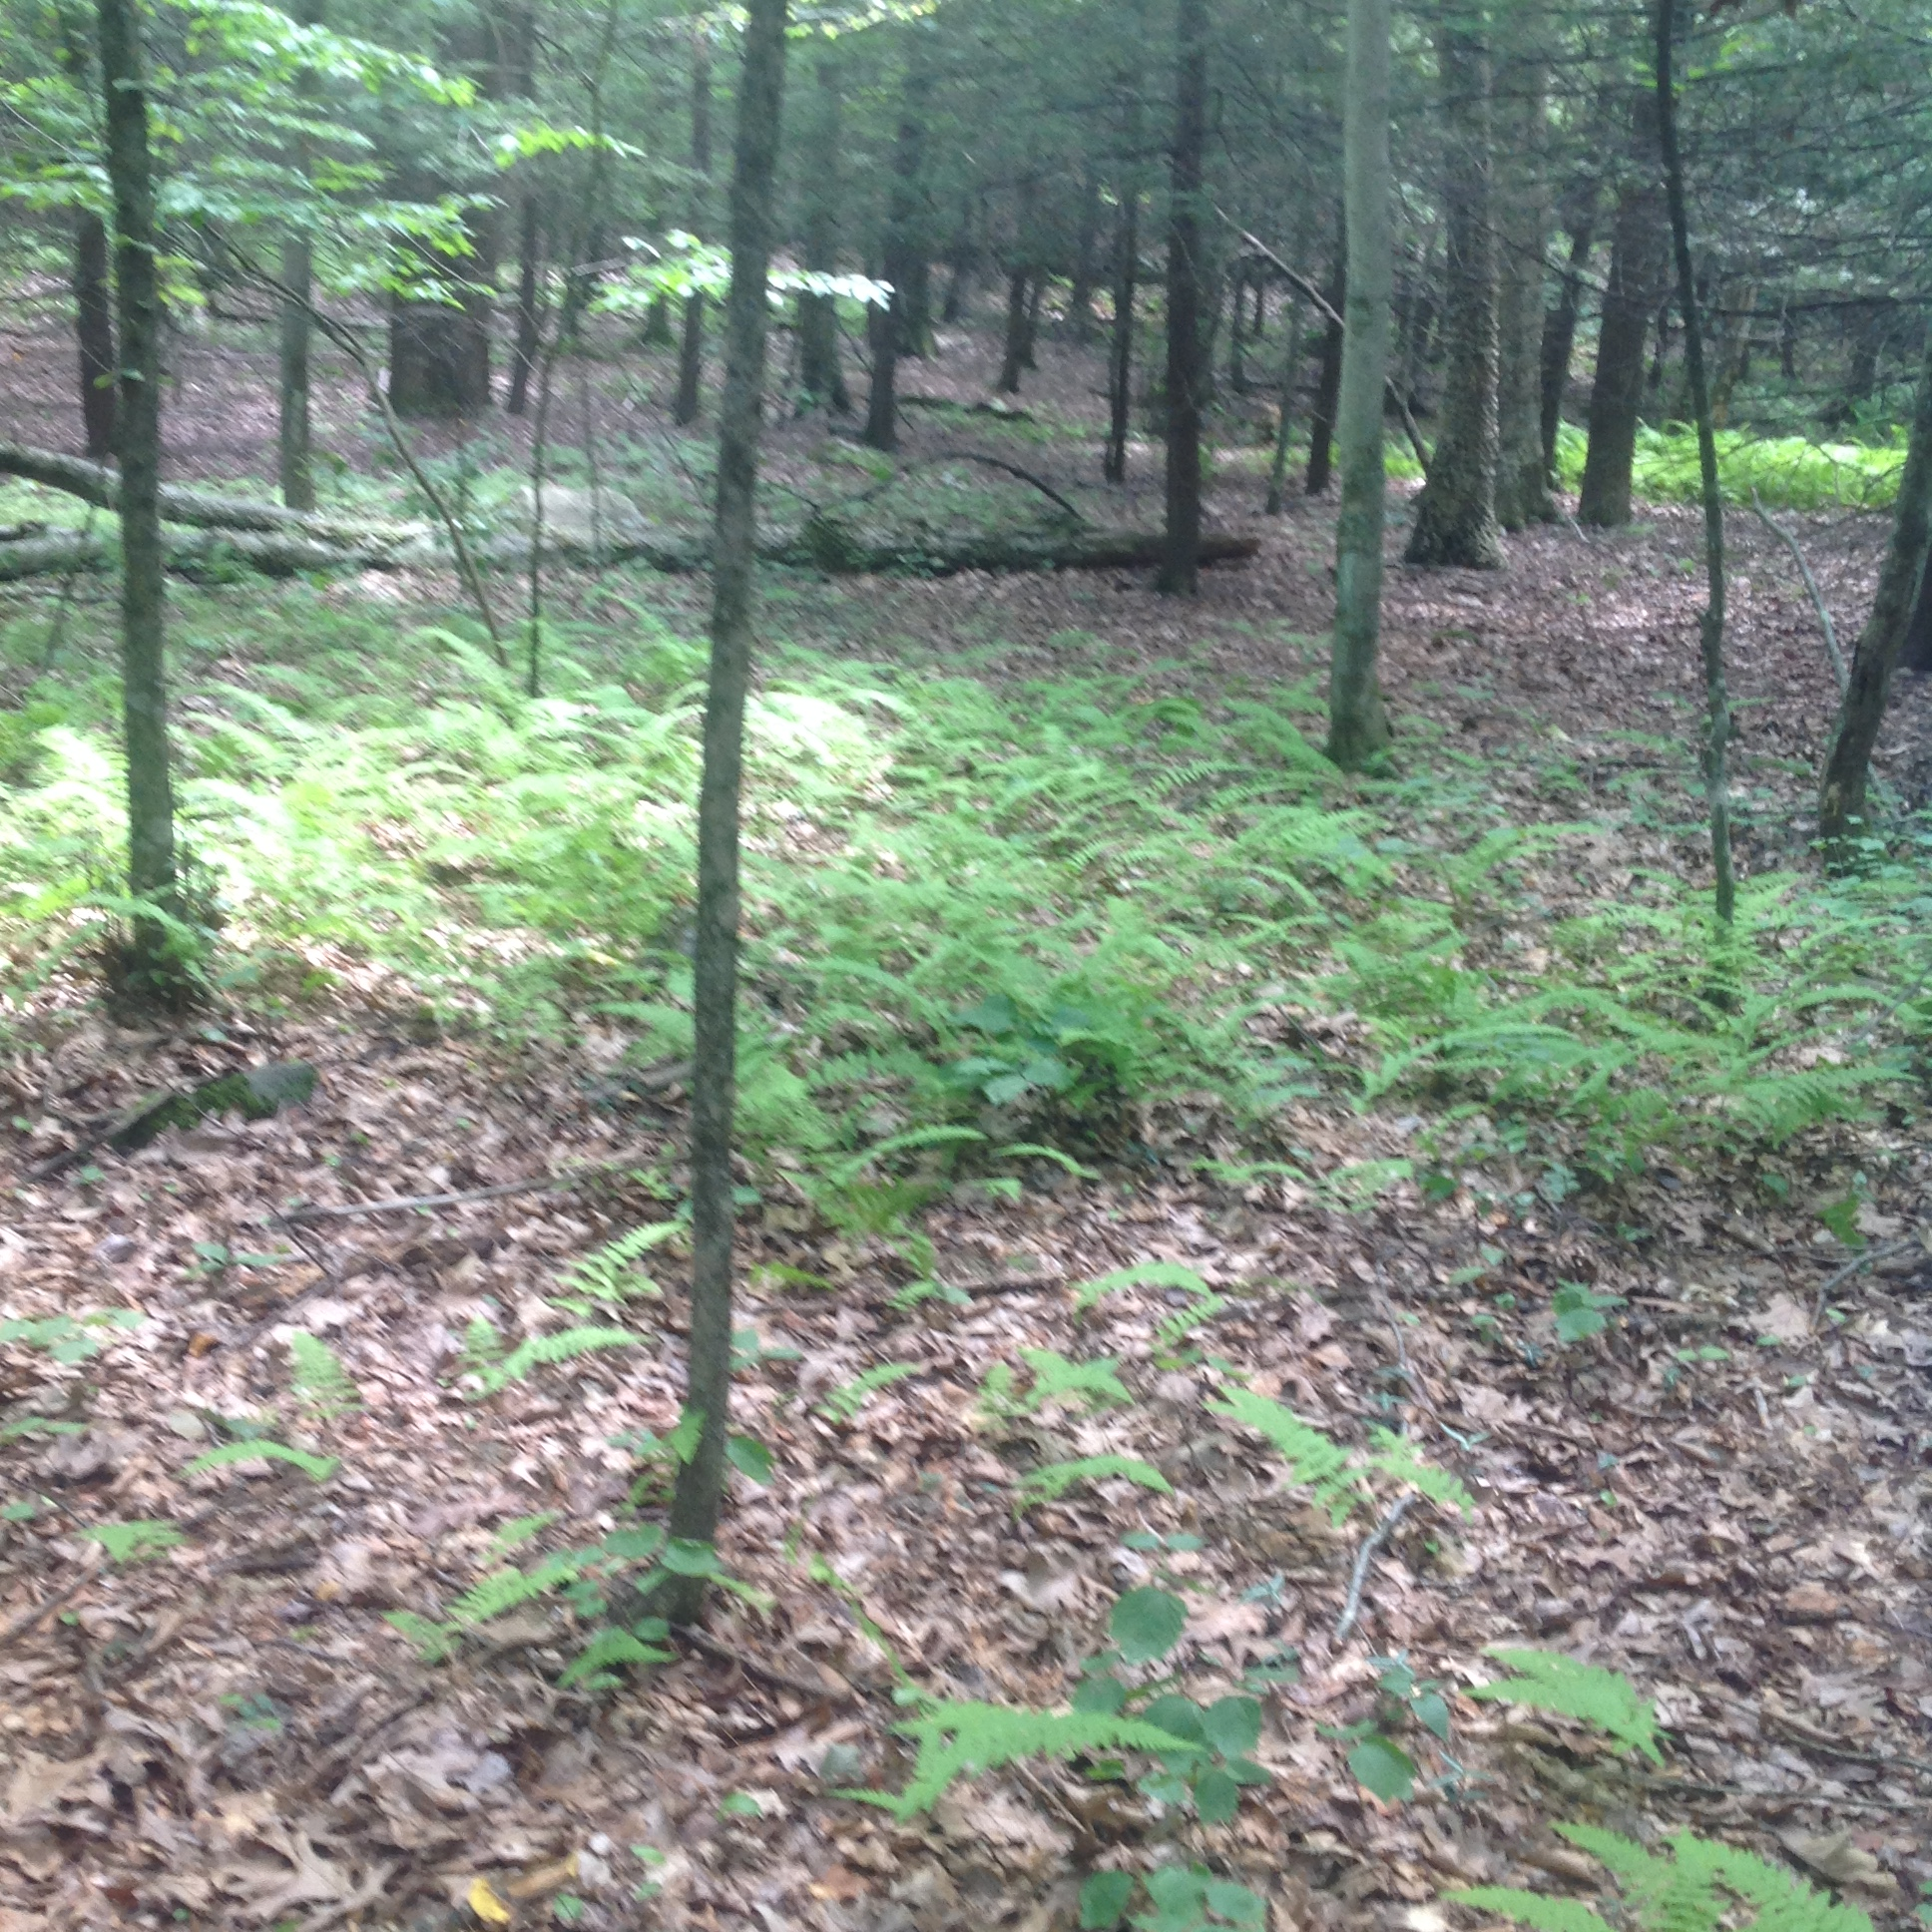 Land for Sale at White Deer Rocks Land 00 White Deer Rocks Rd Woodbury, Connecticut, 06798 United States